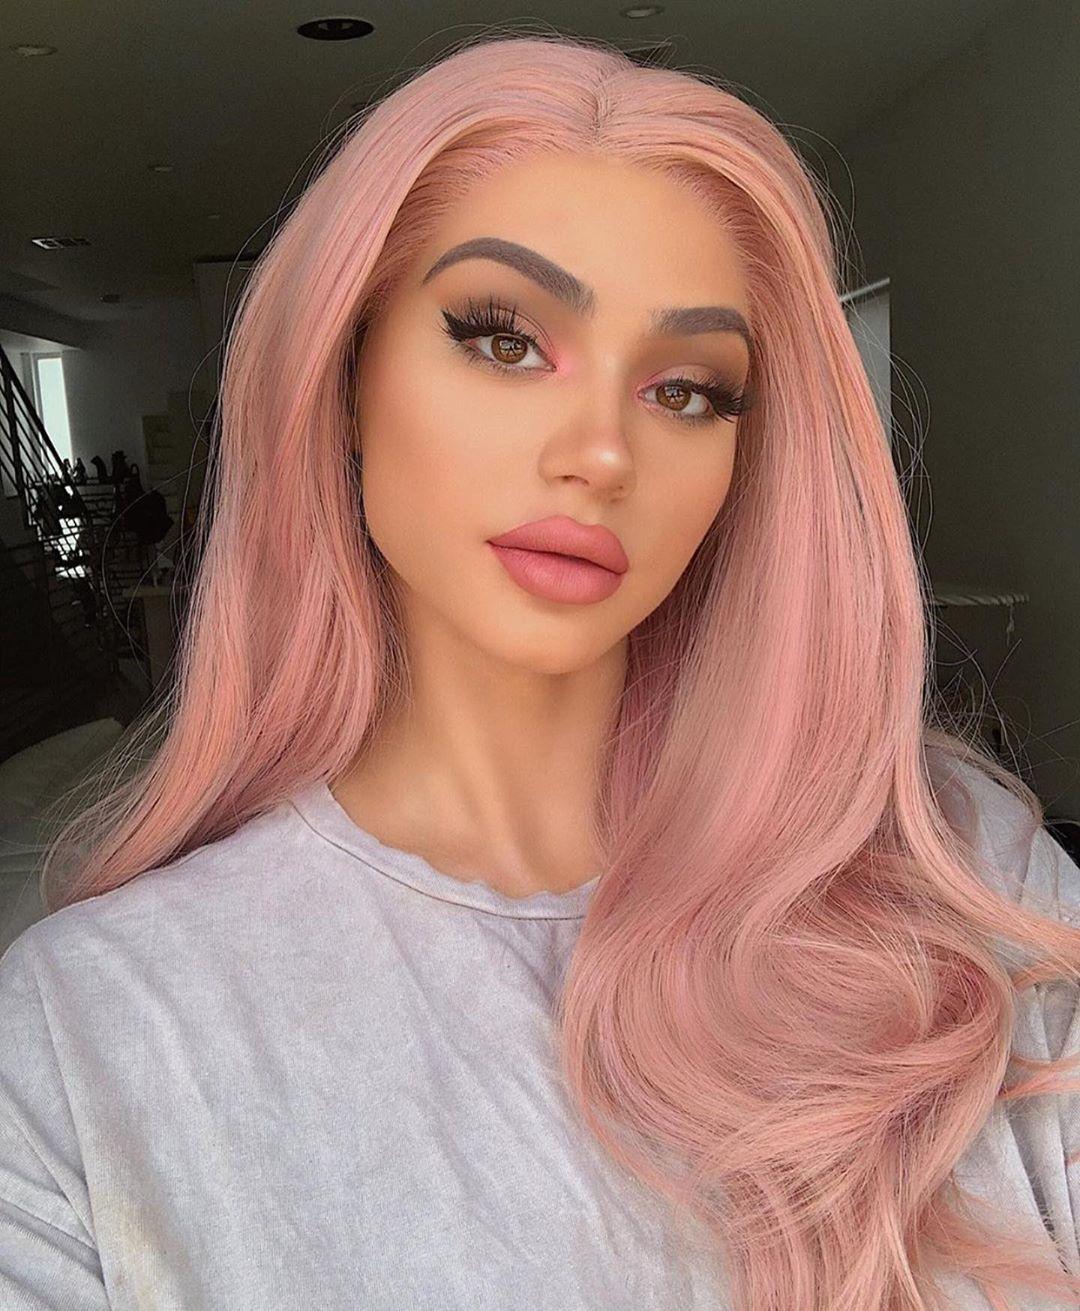 Photo of Lace Front Perücken rosa Perücken für Frauen synthetische Rose Perücke lang gewellt